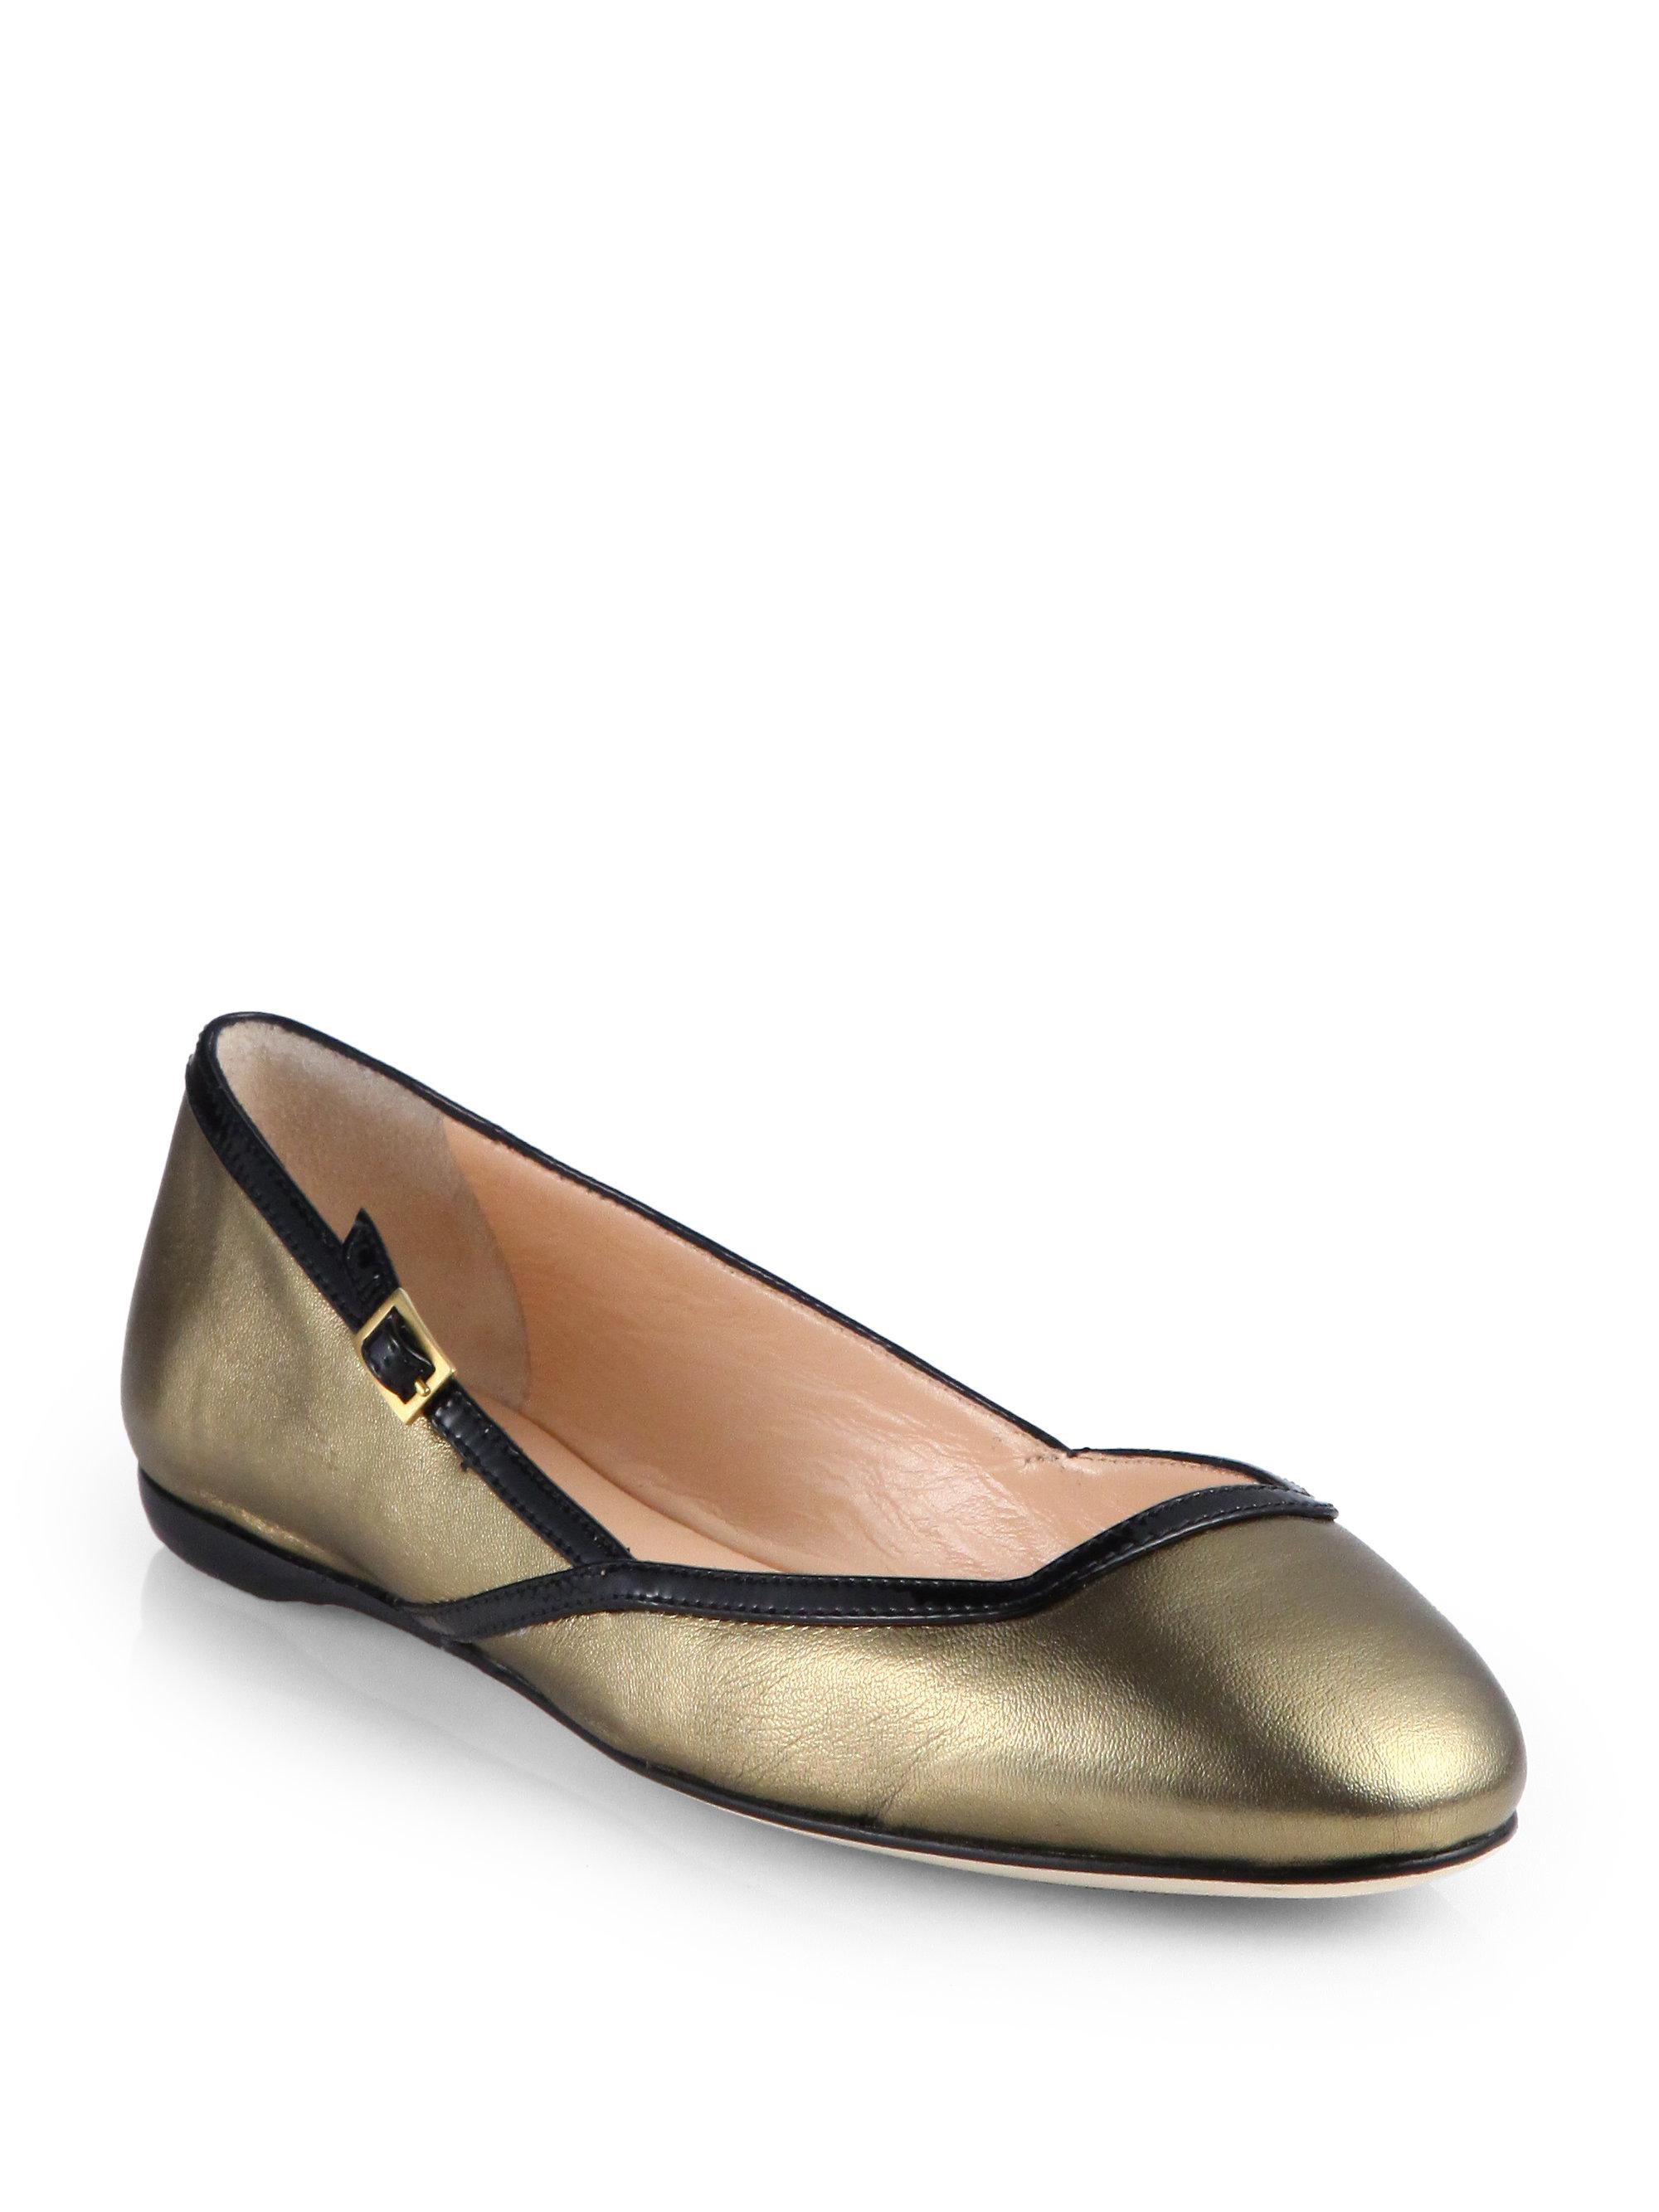 Calvin Klein Eda Metallic Leather Ballet Flats In Gold (GOLD BLACK) | Lyst